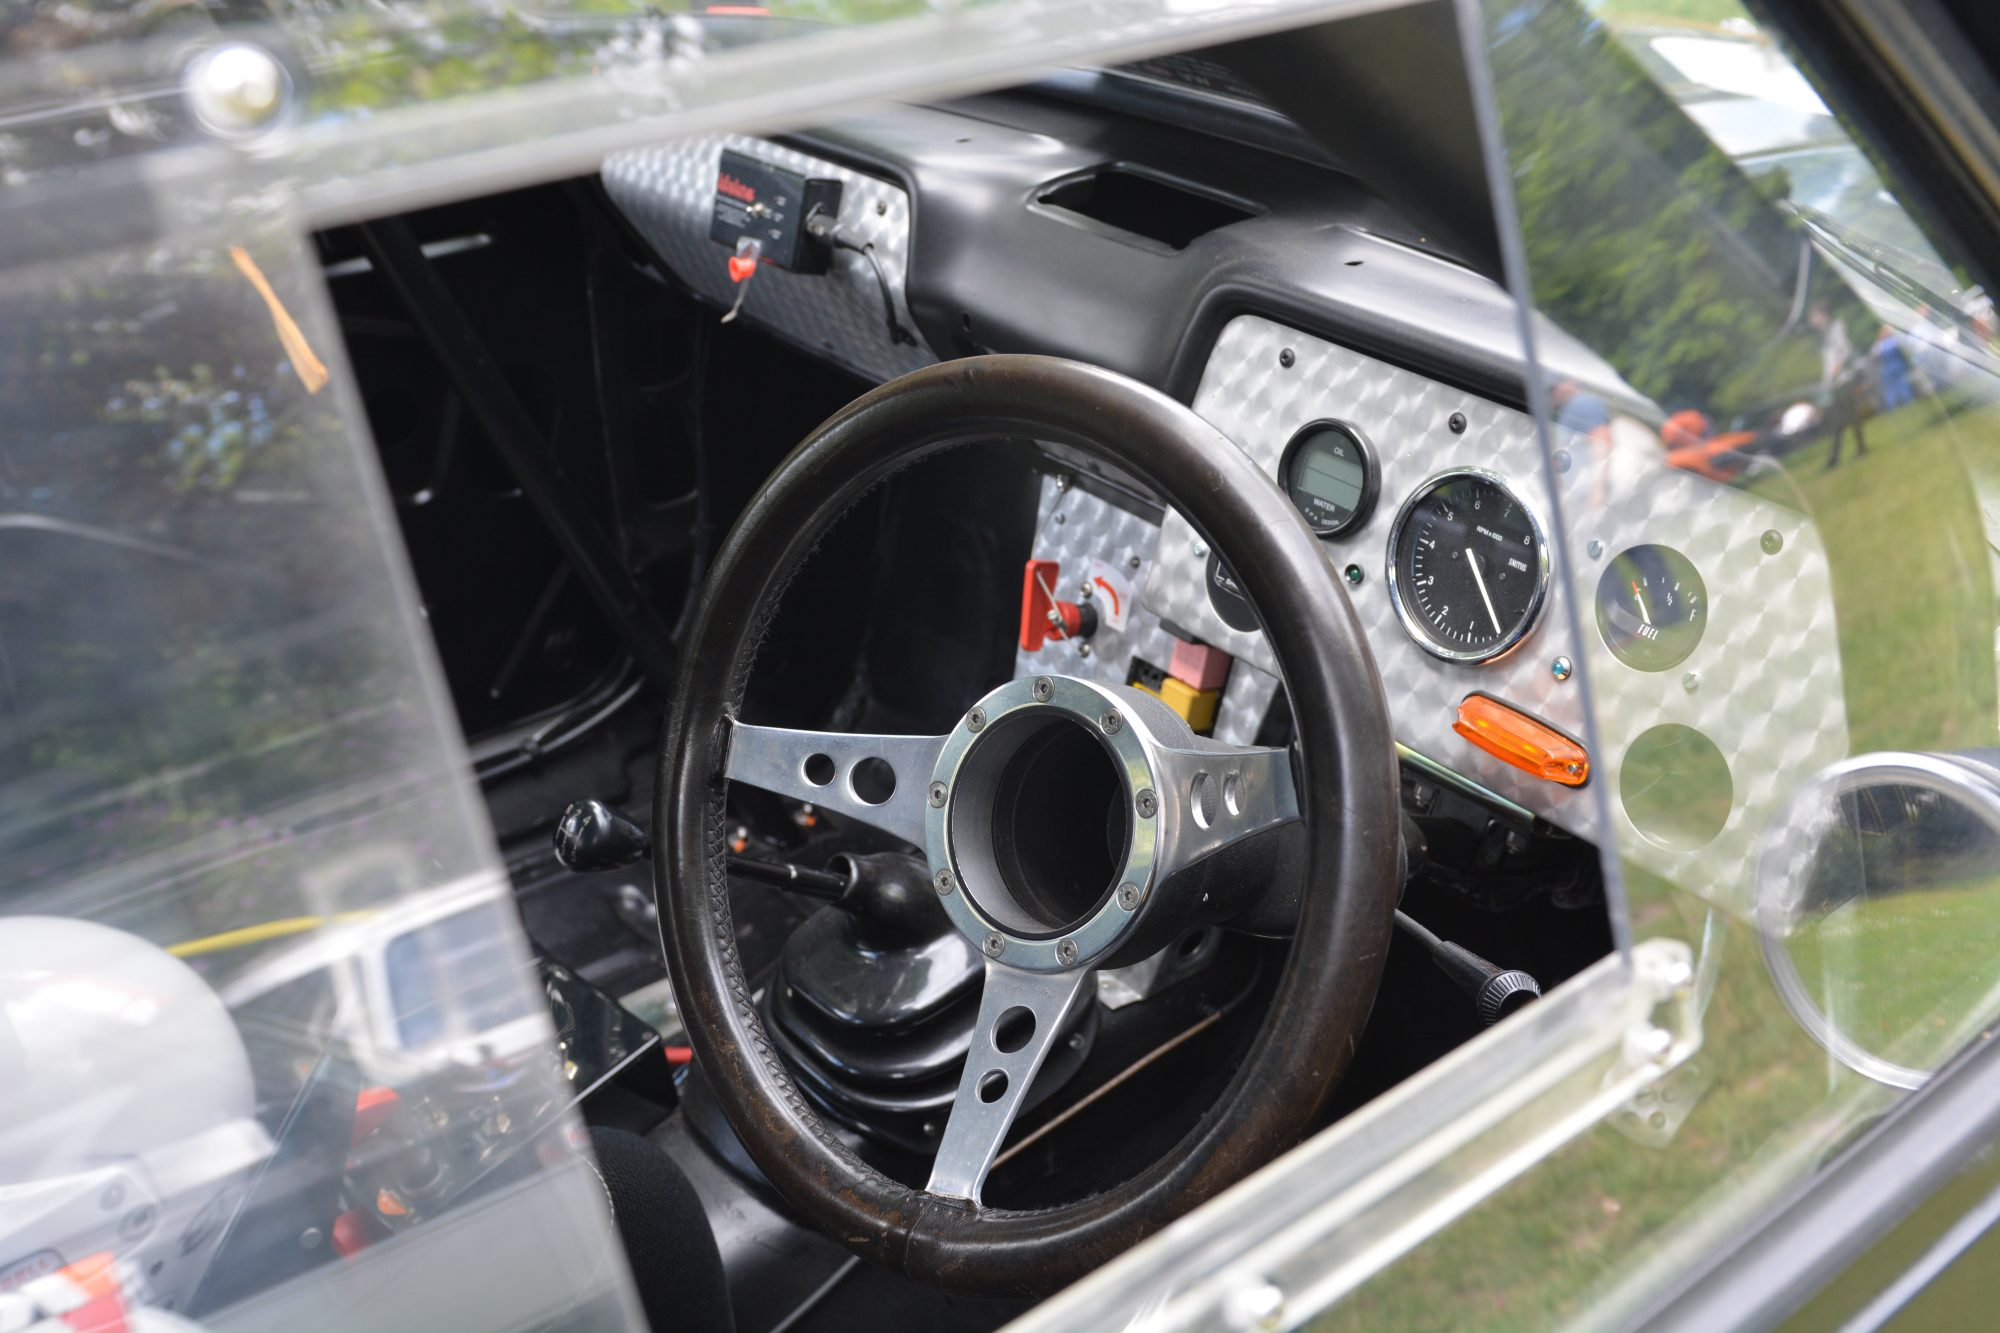 Motorsport, Motorsport at the Palace, Crystal Palace, London car show, classic car, show, classic motorsport, TR6, Vauxhall Viva GT interior